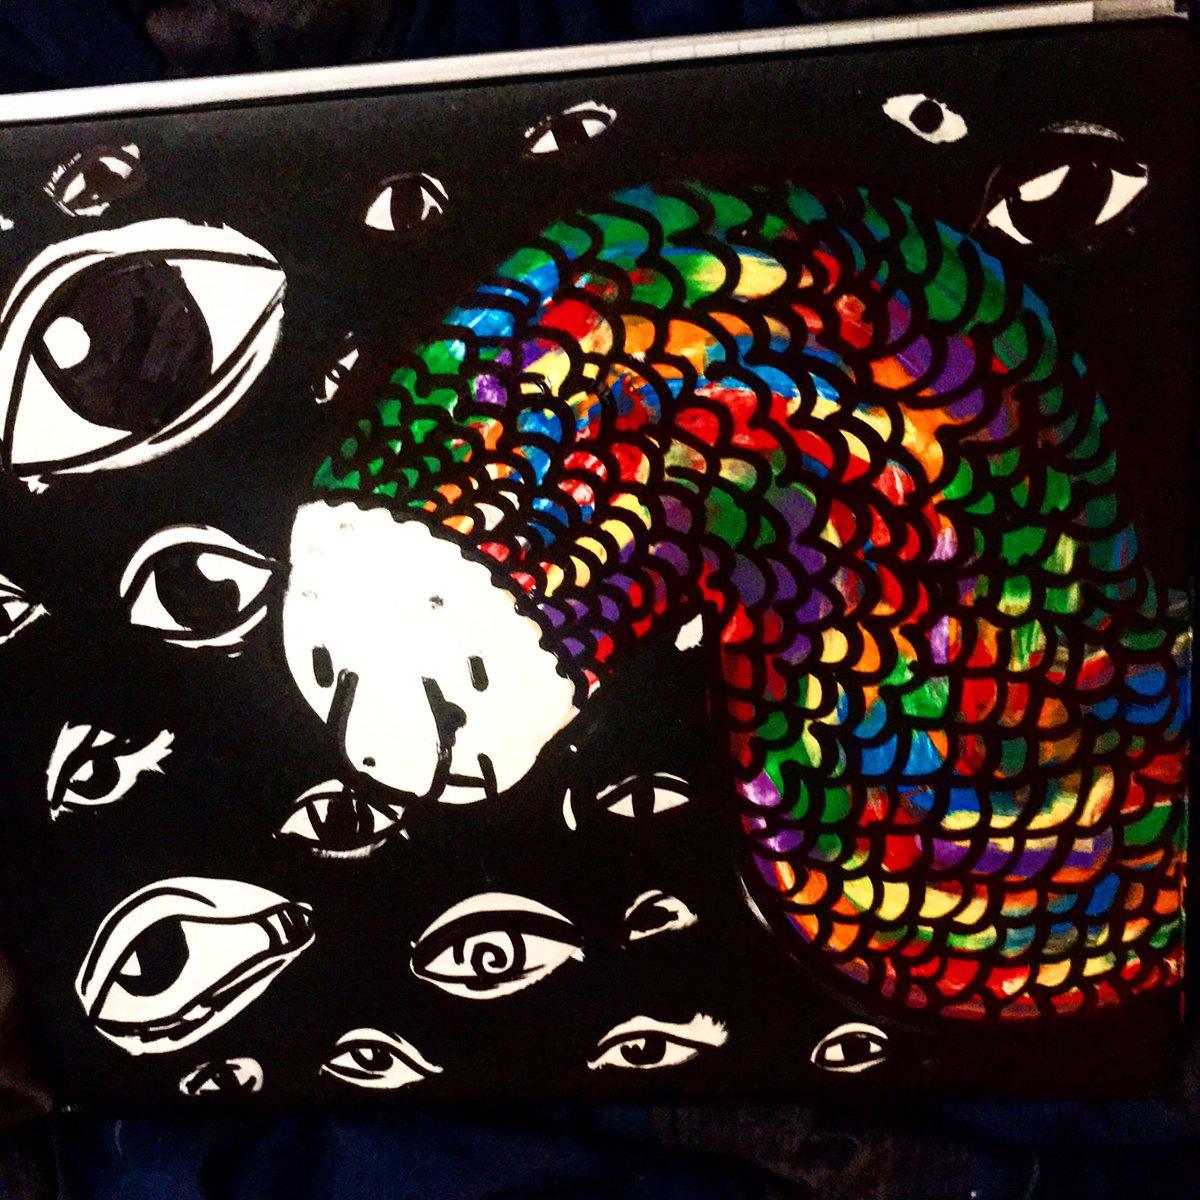 I paint ....idk what it is but I like it   #draw #drawing #art #artist #artistsoninstagram #paint #painting #paintings #creepy #creepyart #rainbow #eyeball #worm #dreams #illustration #illustrator #illustrationartists #illustratorsoninstagram #pandaelfpic.twitter.com/IgCYmG9H9X